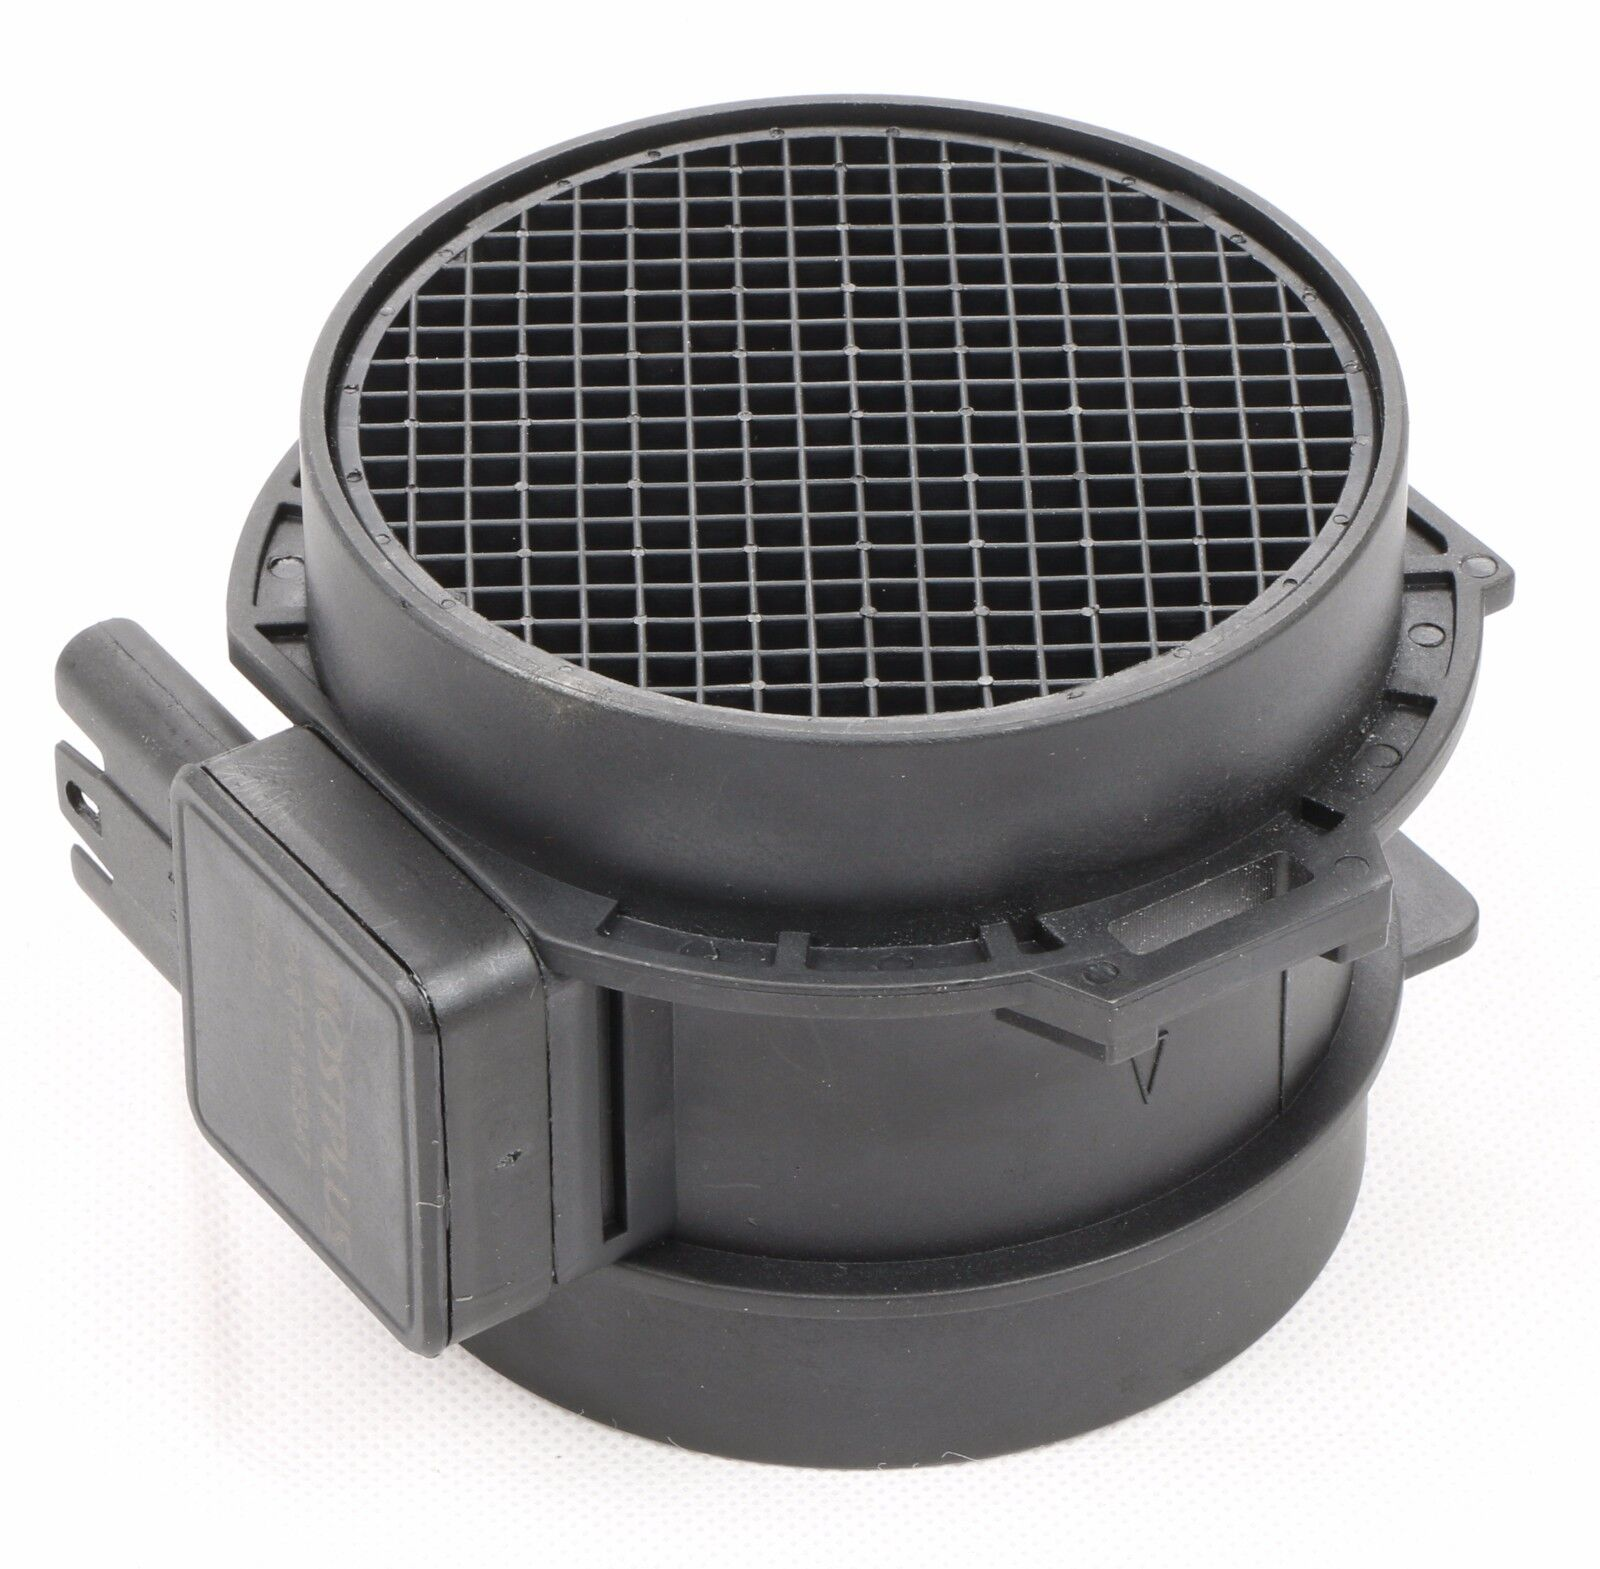 Bmw Z4 Diesel For Sale: NEW Mass Air Flow Meter MAF Sensor For BMW 330Ci 325Ci X3